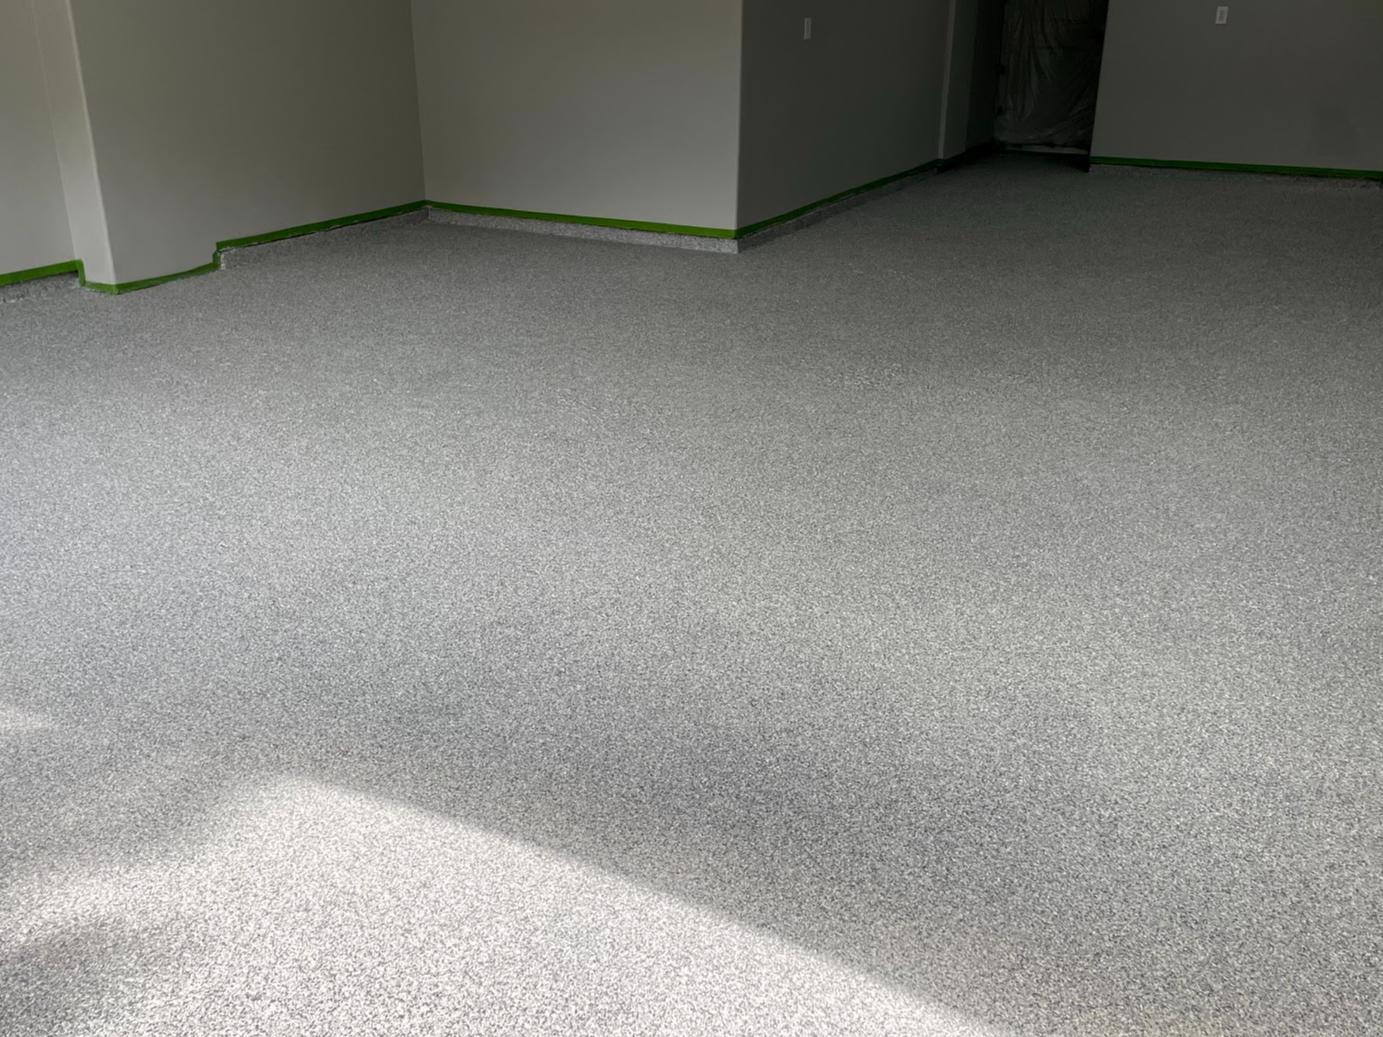 Garage floor make-over in Katy, TX - After Photo